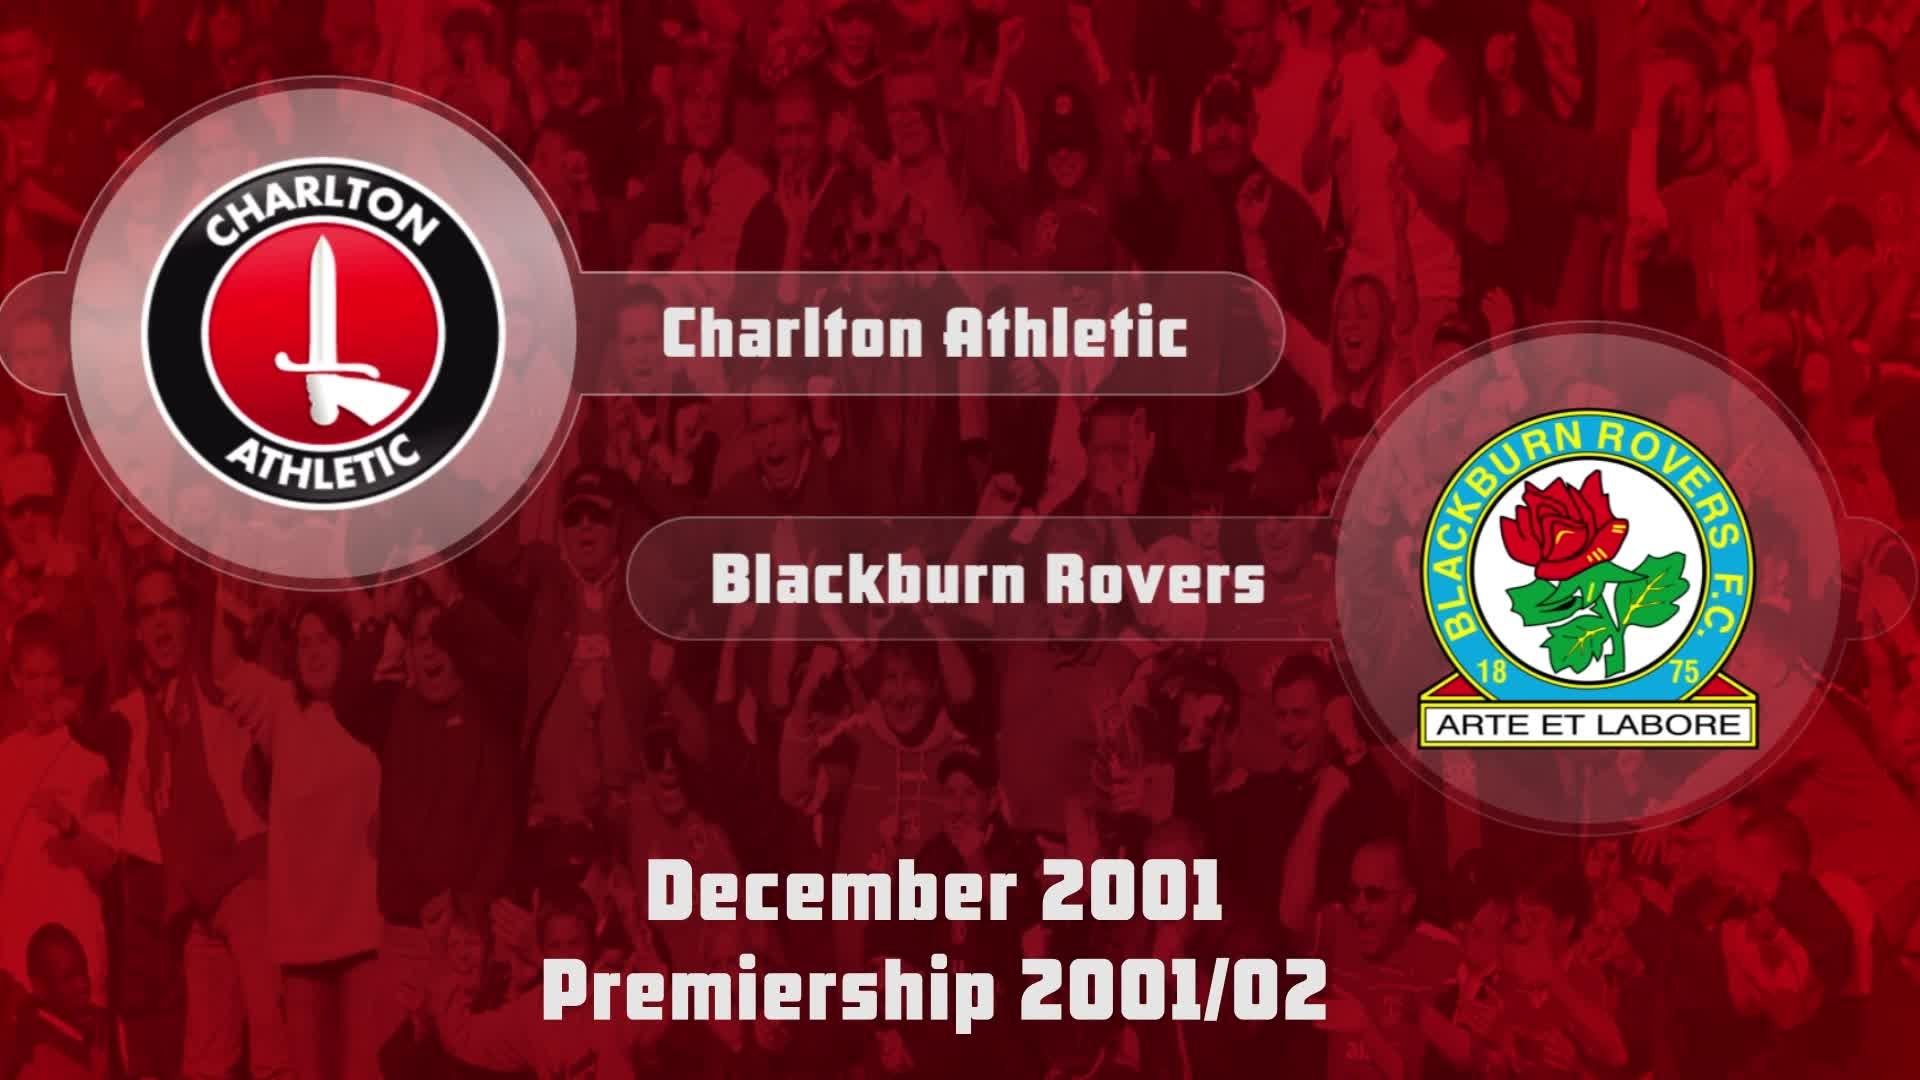 21 HIGHLIGHTS | Charlton 0 Blackburn 2 (Dec 2001)